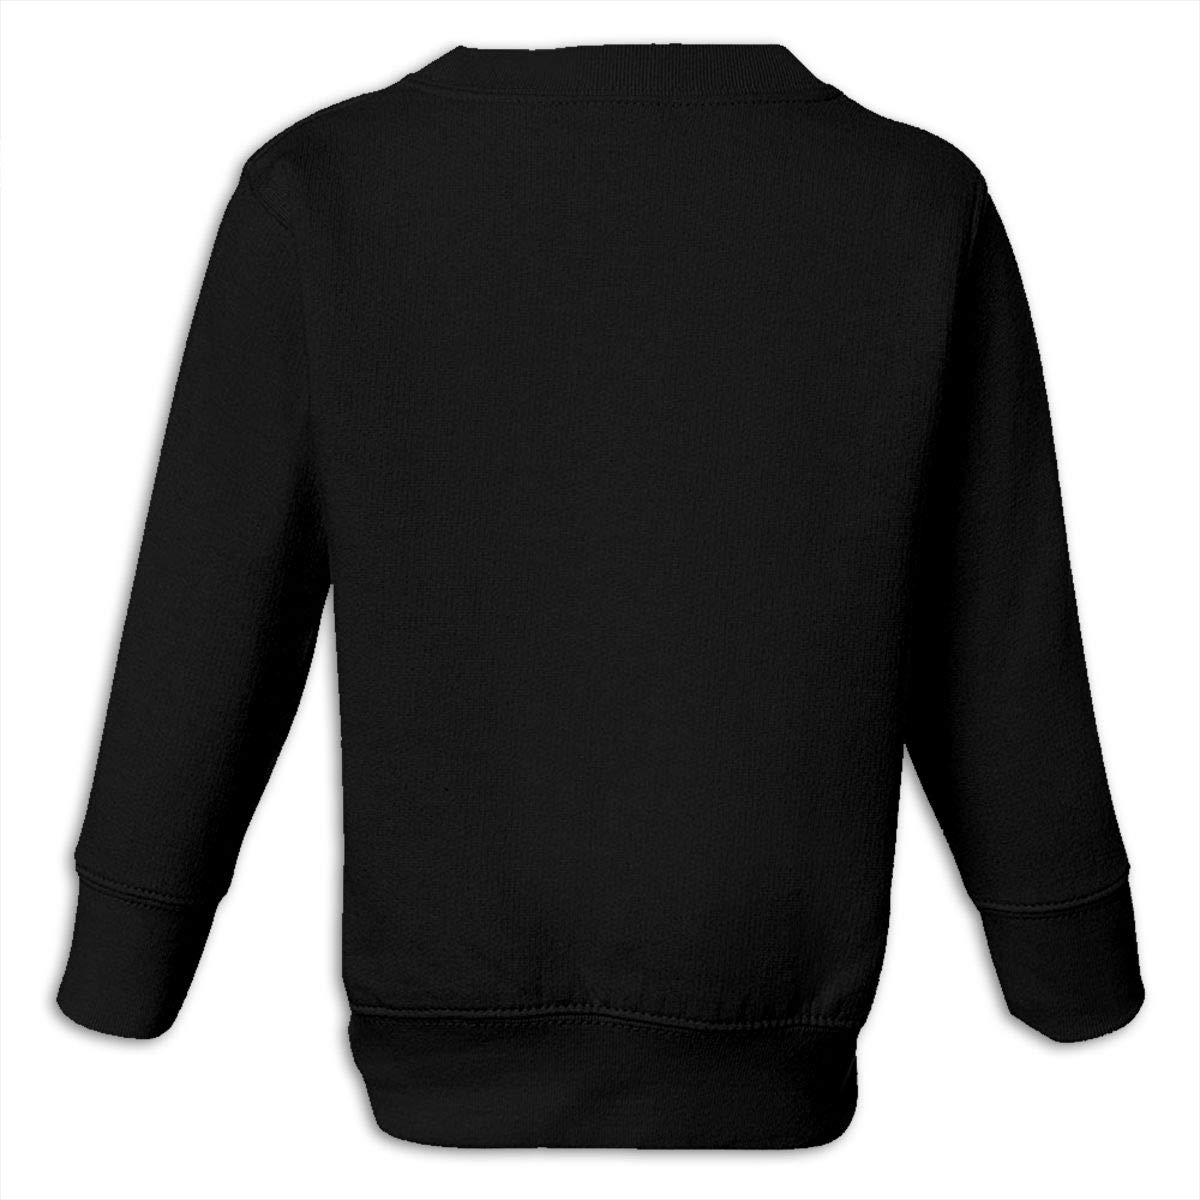 Peter-bilt Toddler//Juvenile Crew Neck Sweatshirt Black